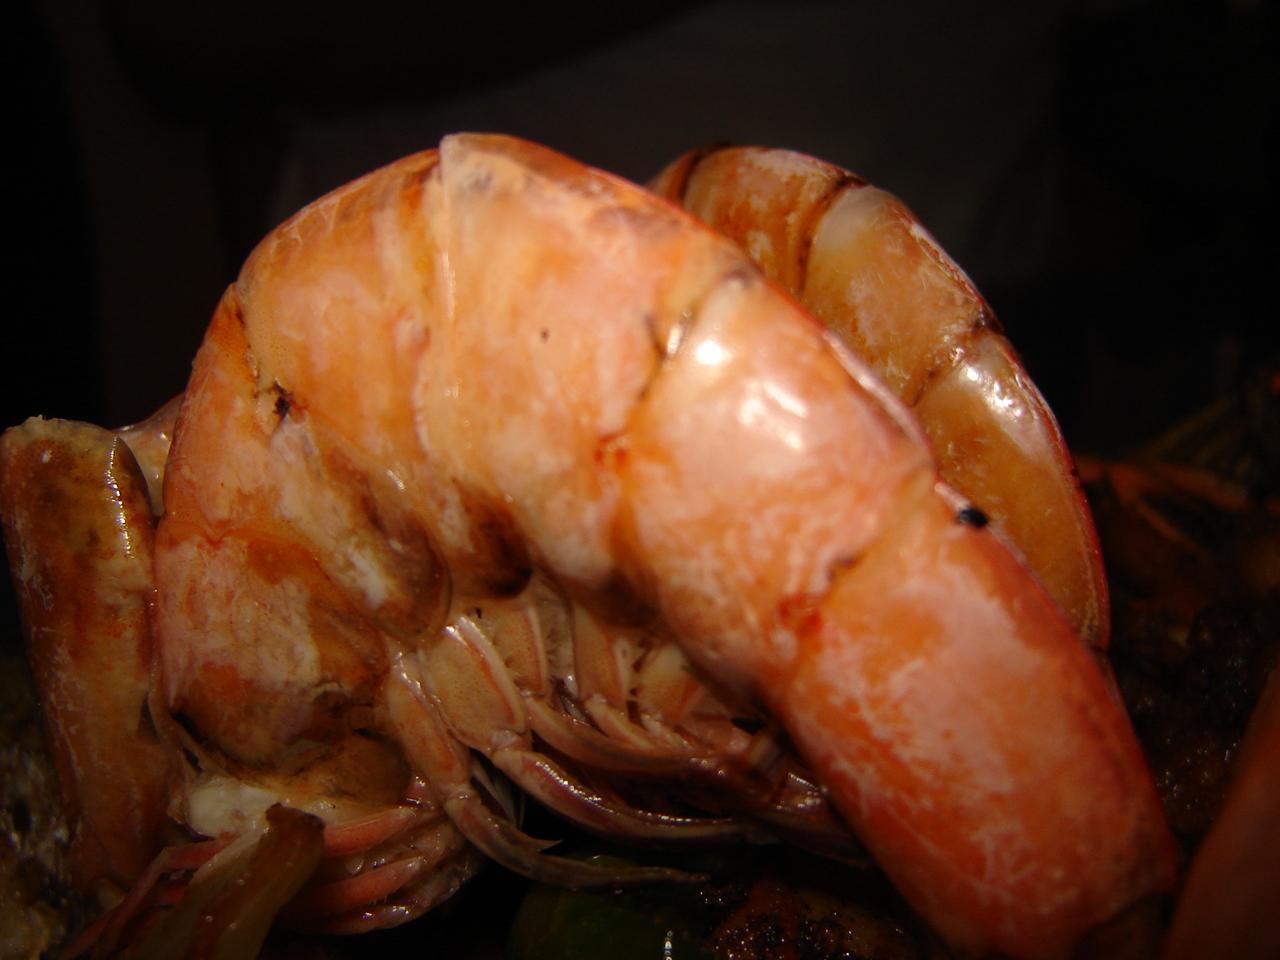 Now, _THAT_ is a shrimp!